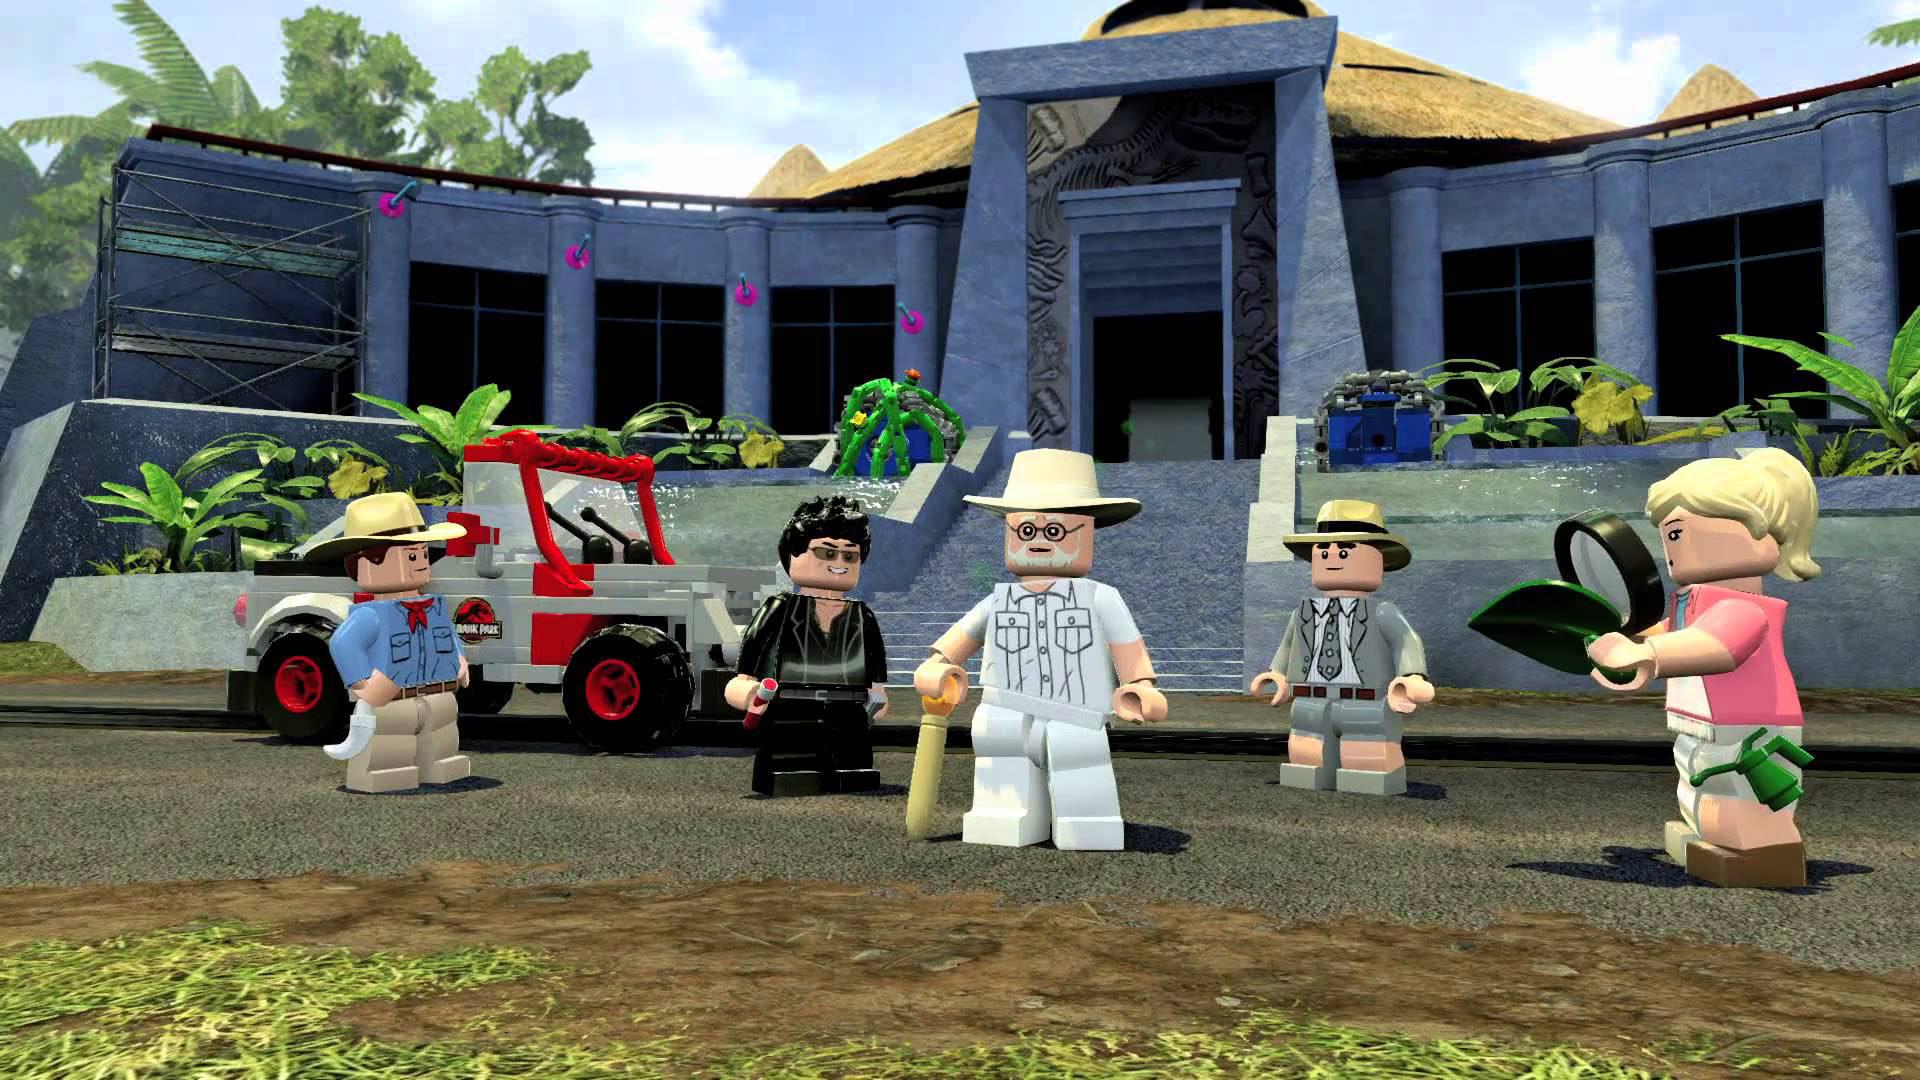 LEGO Jurassic World' Review: Dino Smash! | Tech Times